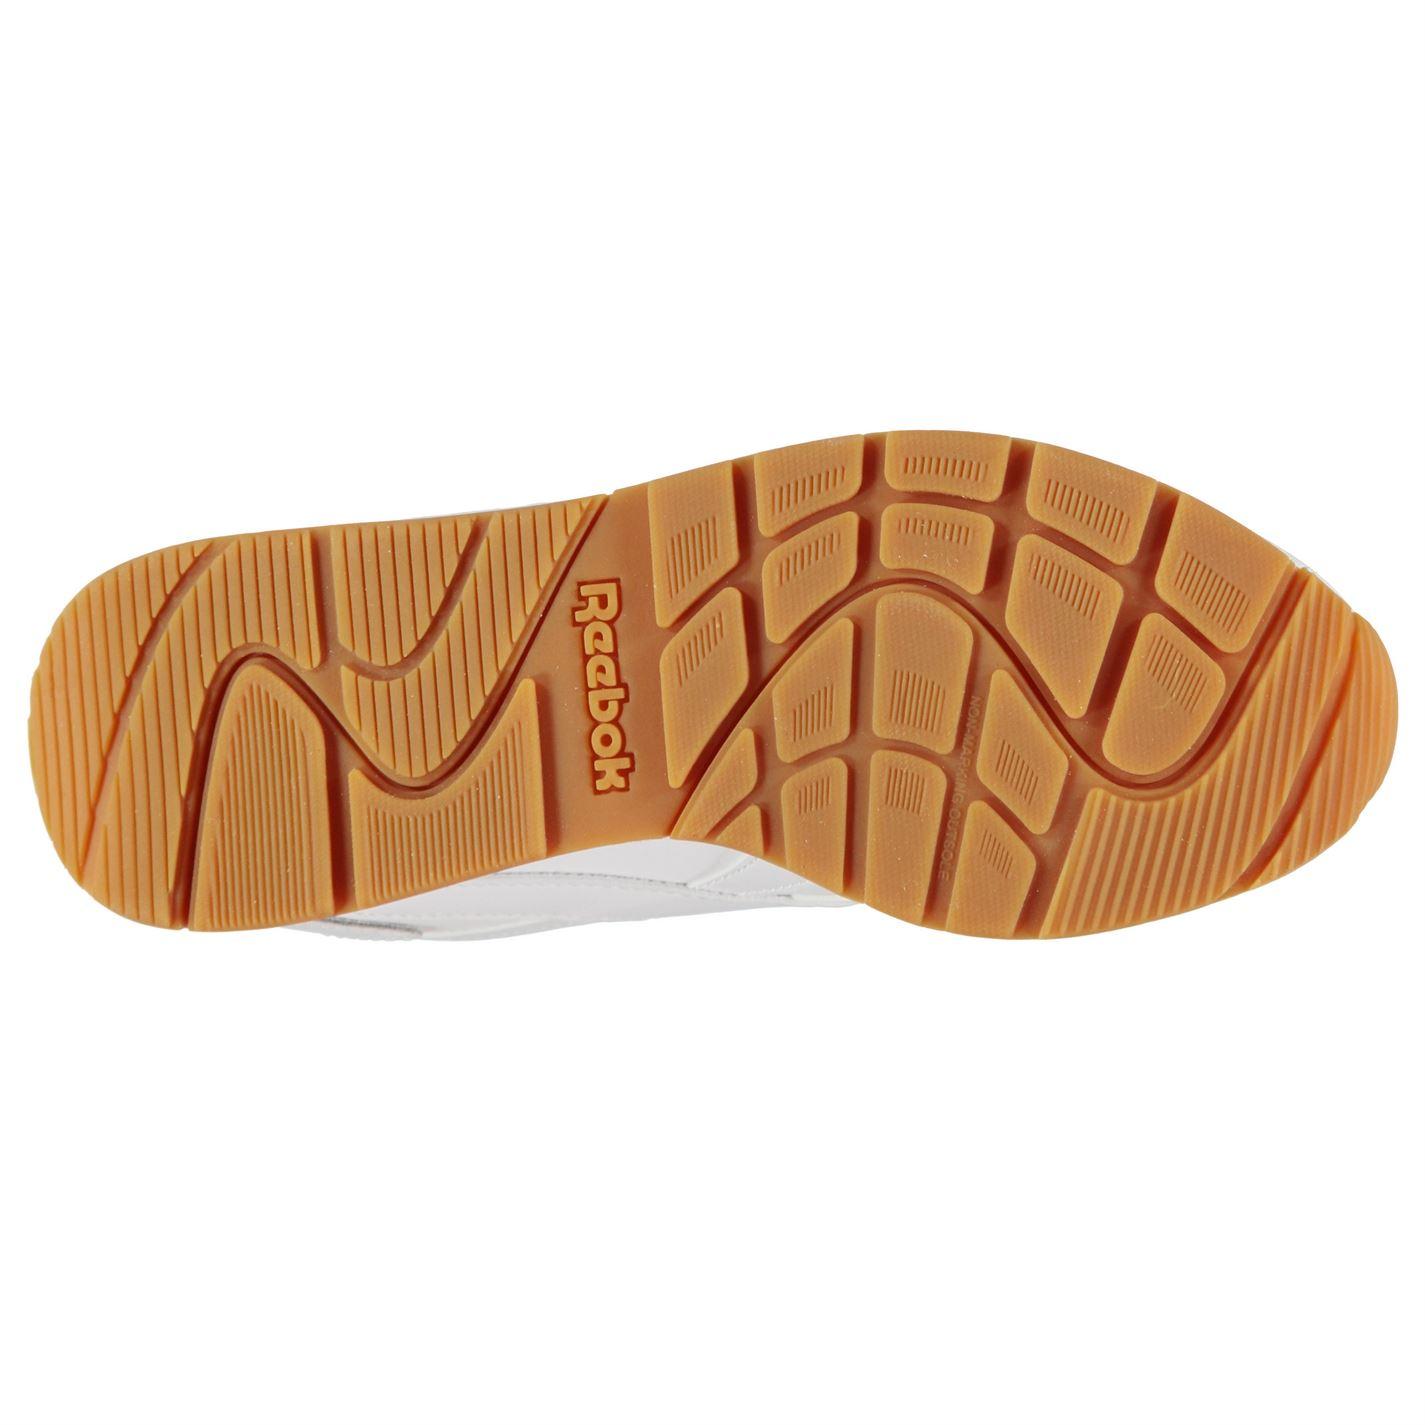 blanca con Reebok Lengua Laces de acolchado goma Classic Sneakers Ladies cuello tobillo Glide blanca XPqnwPrvR